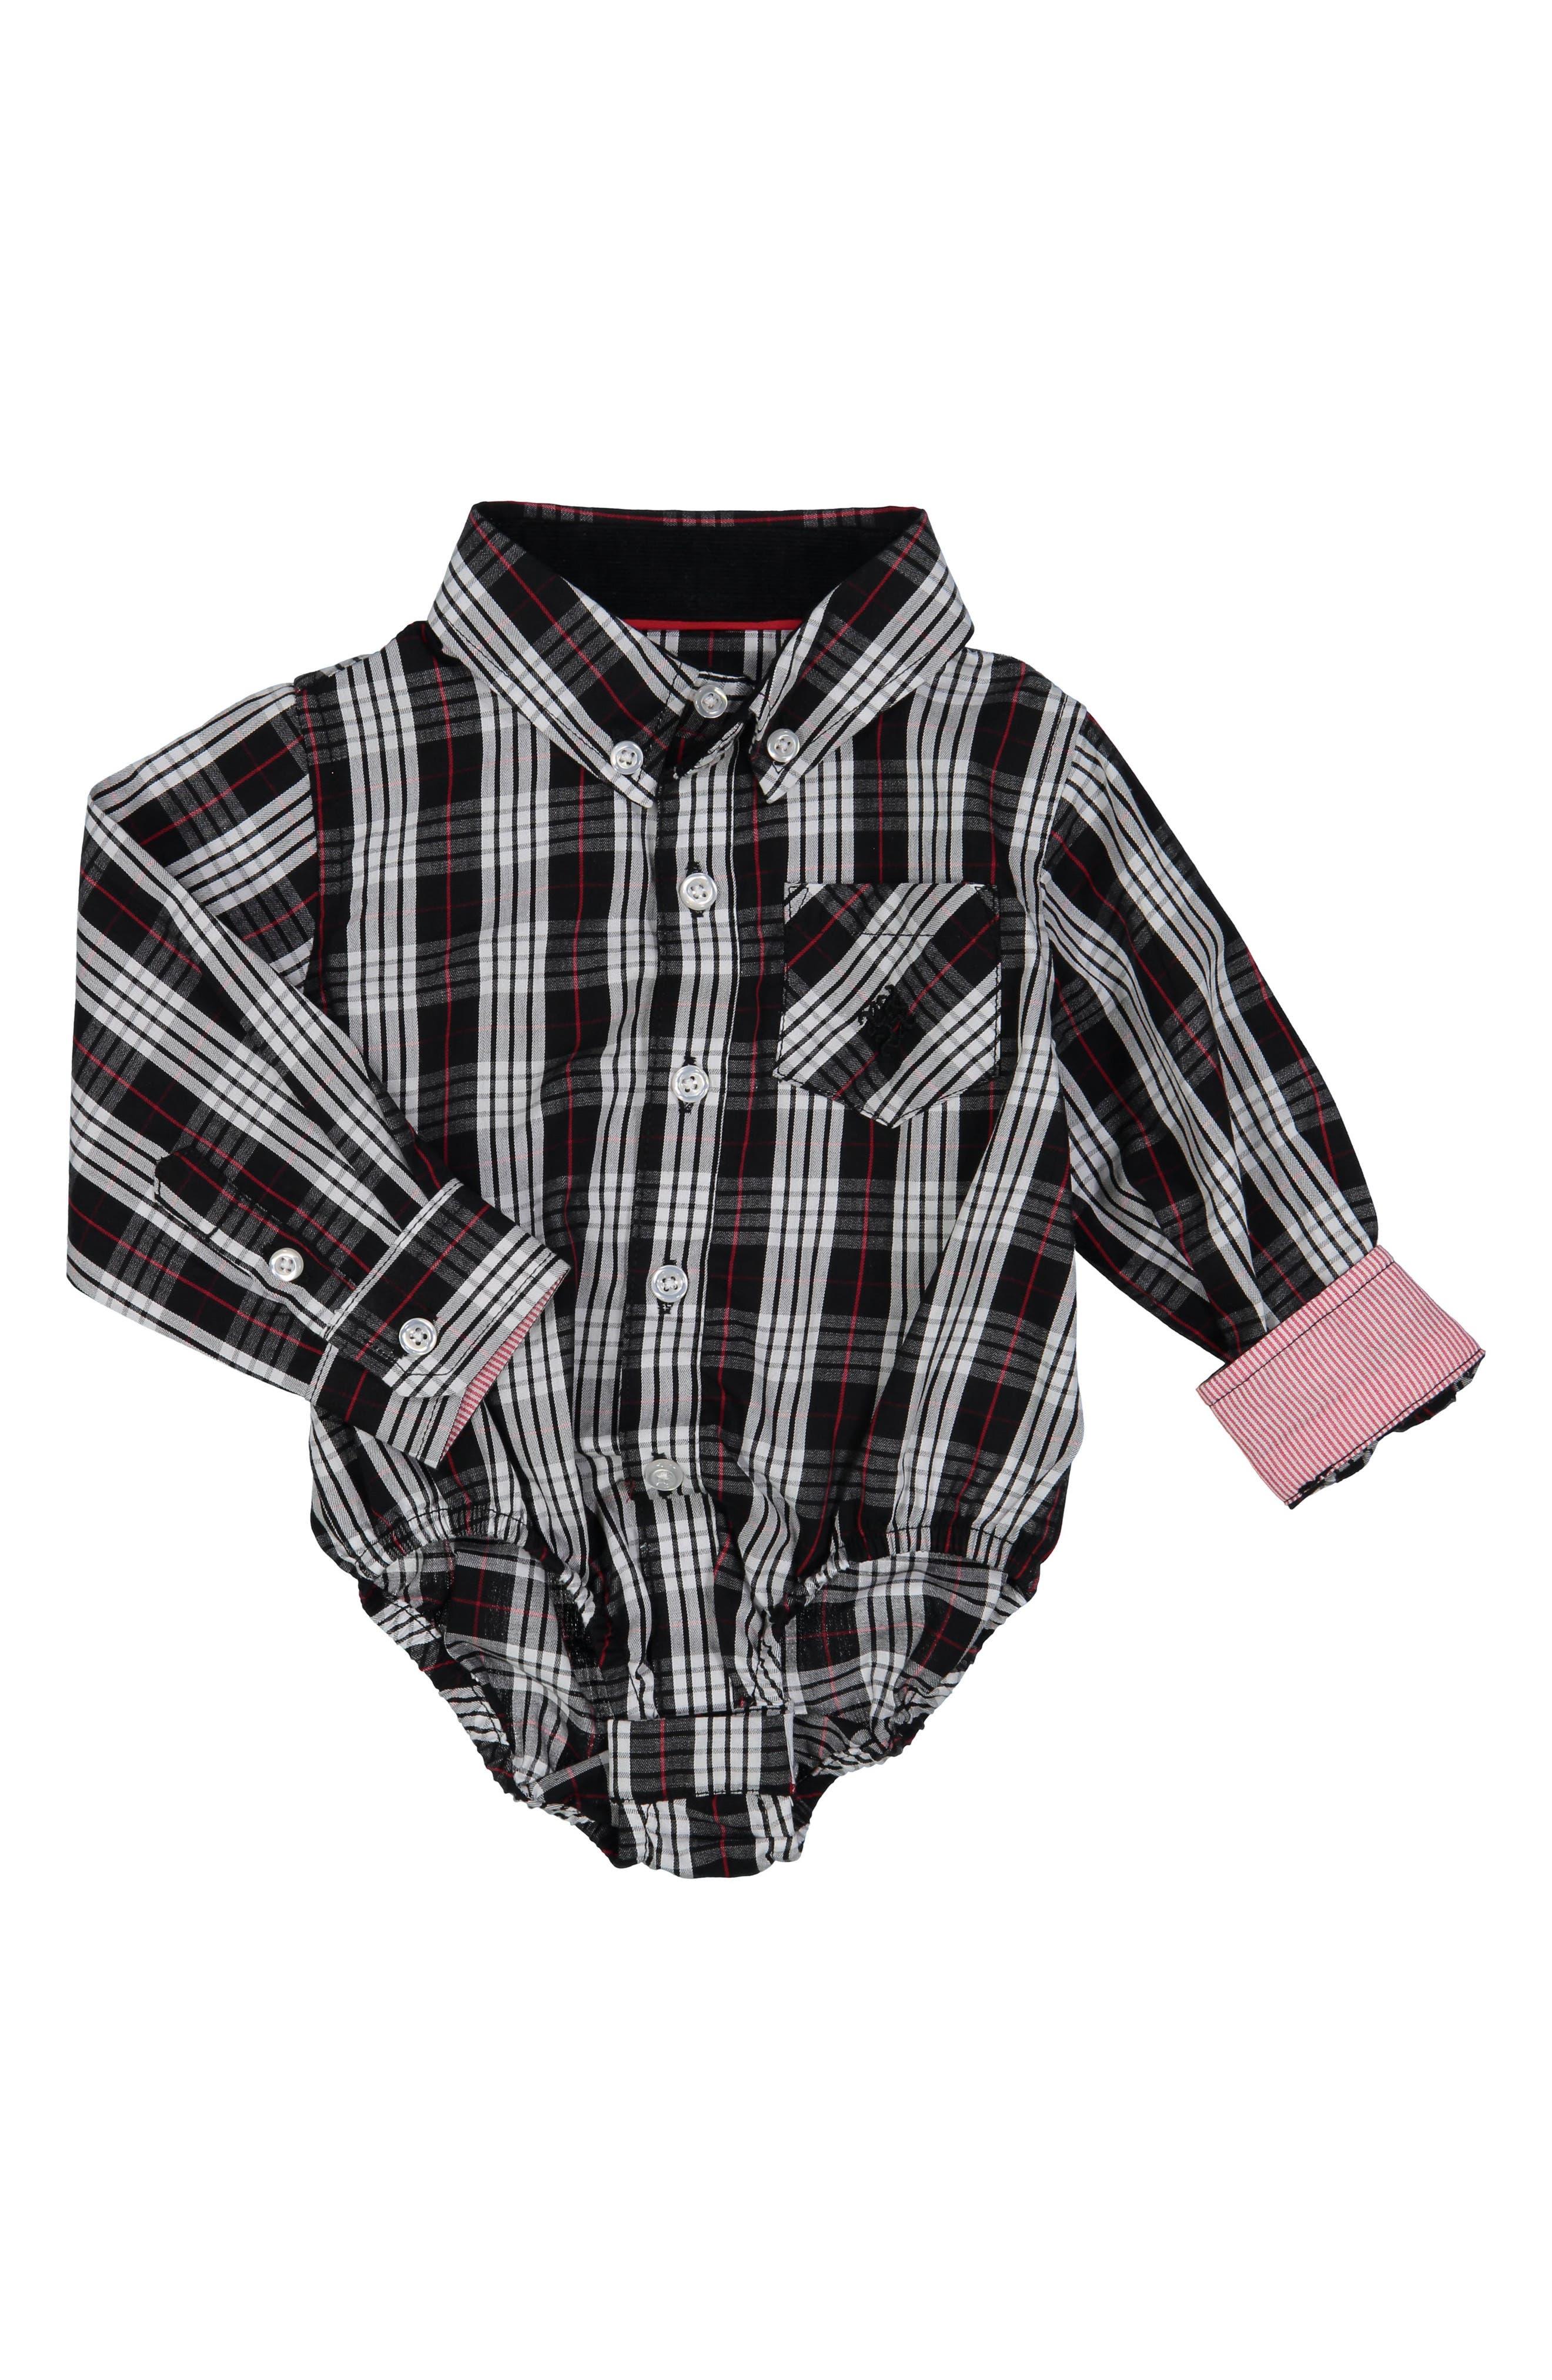 Shirtzie Holiday Check Bodysuit,                         Main,                         color, Black